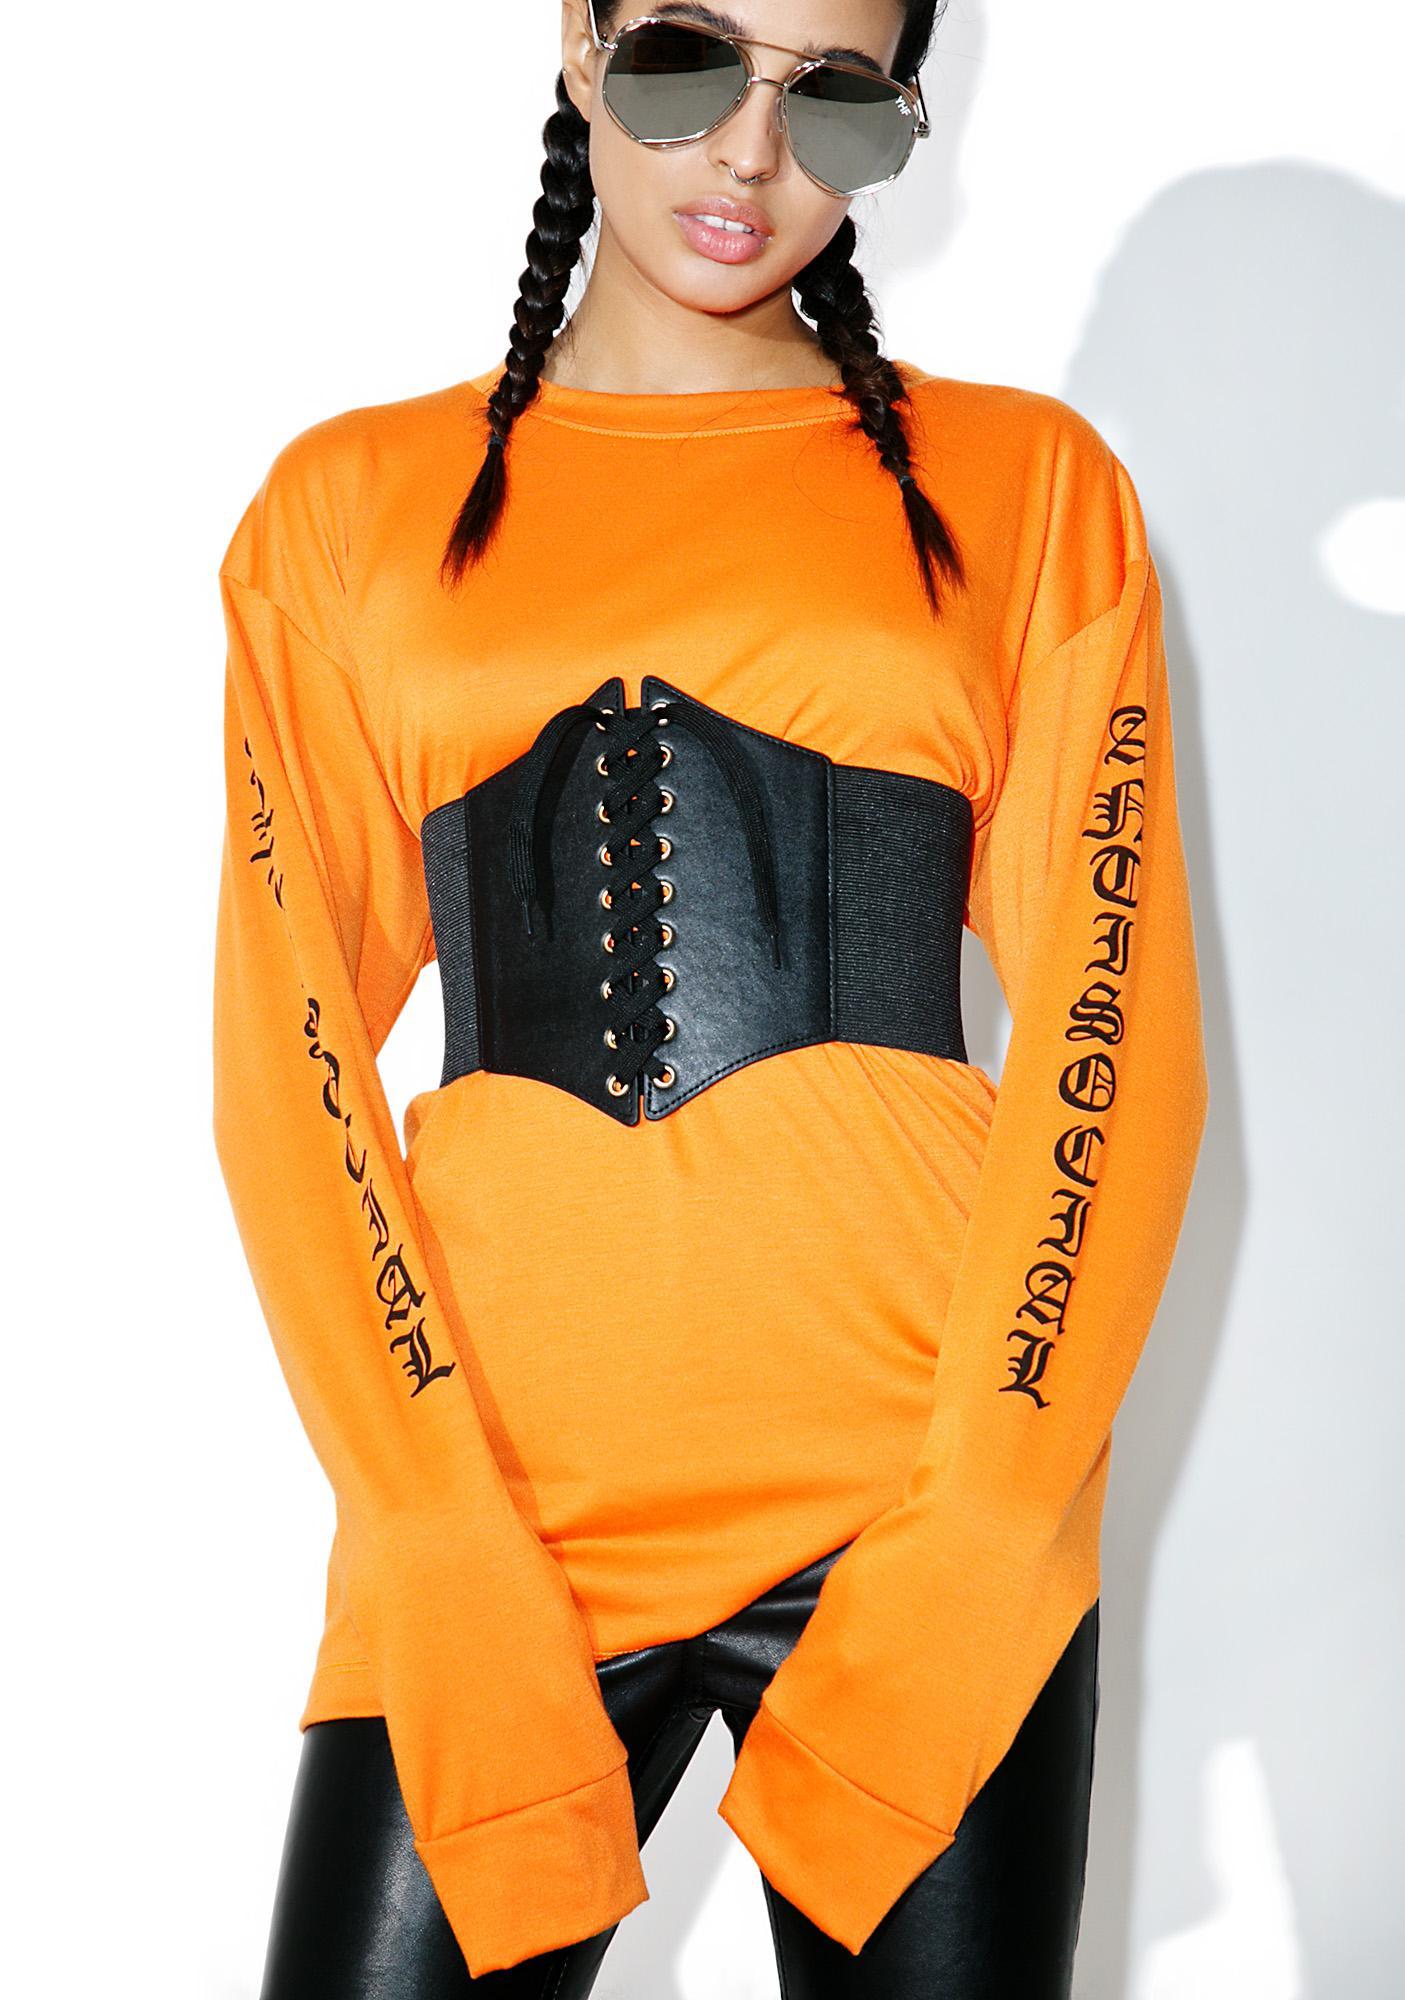 Stinger Lace-Up Waist Belt